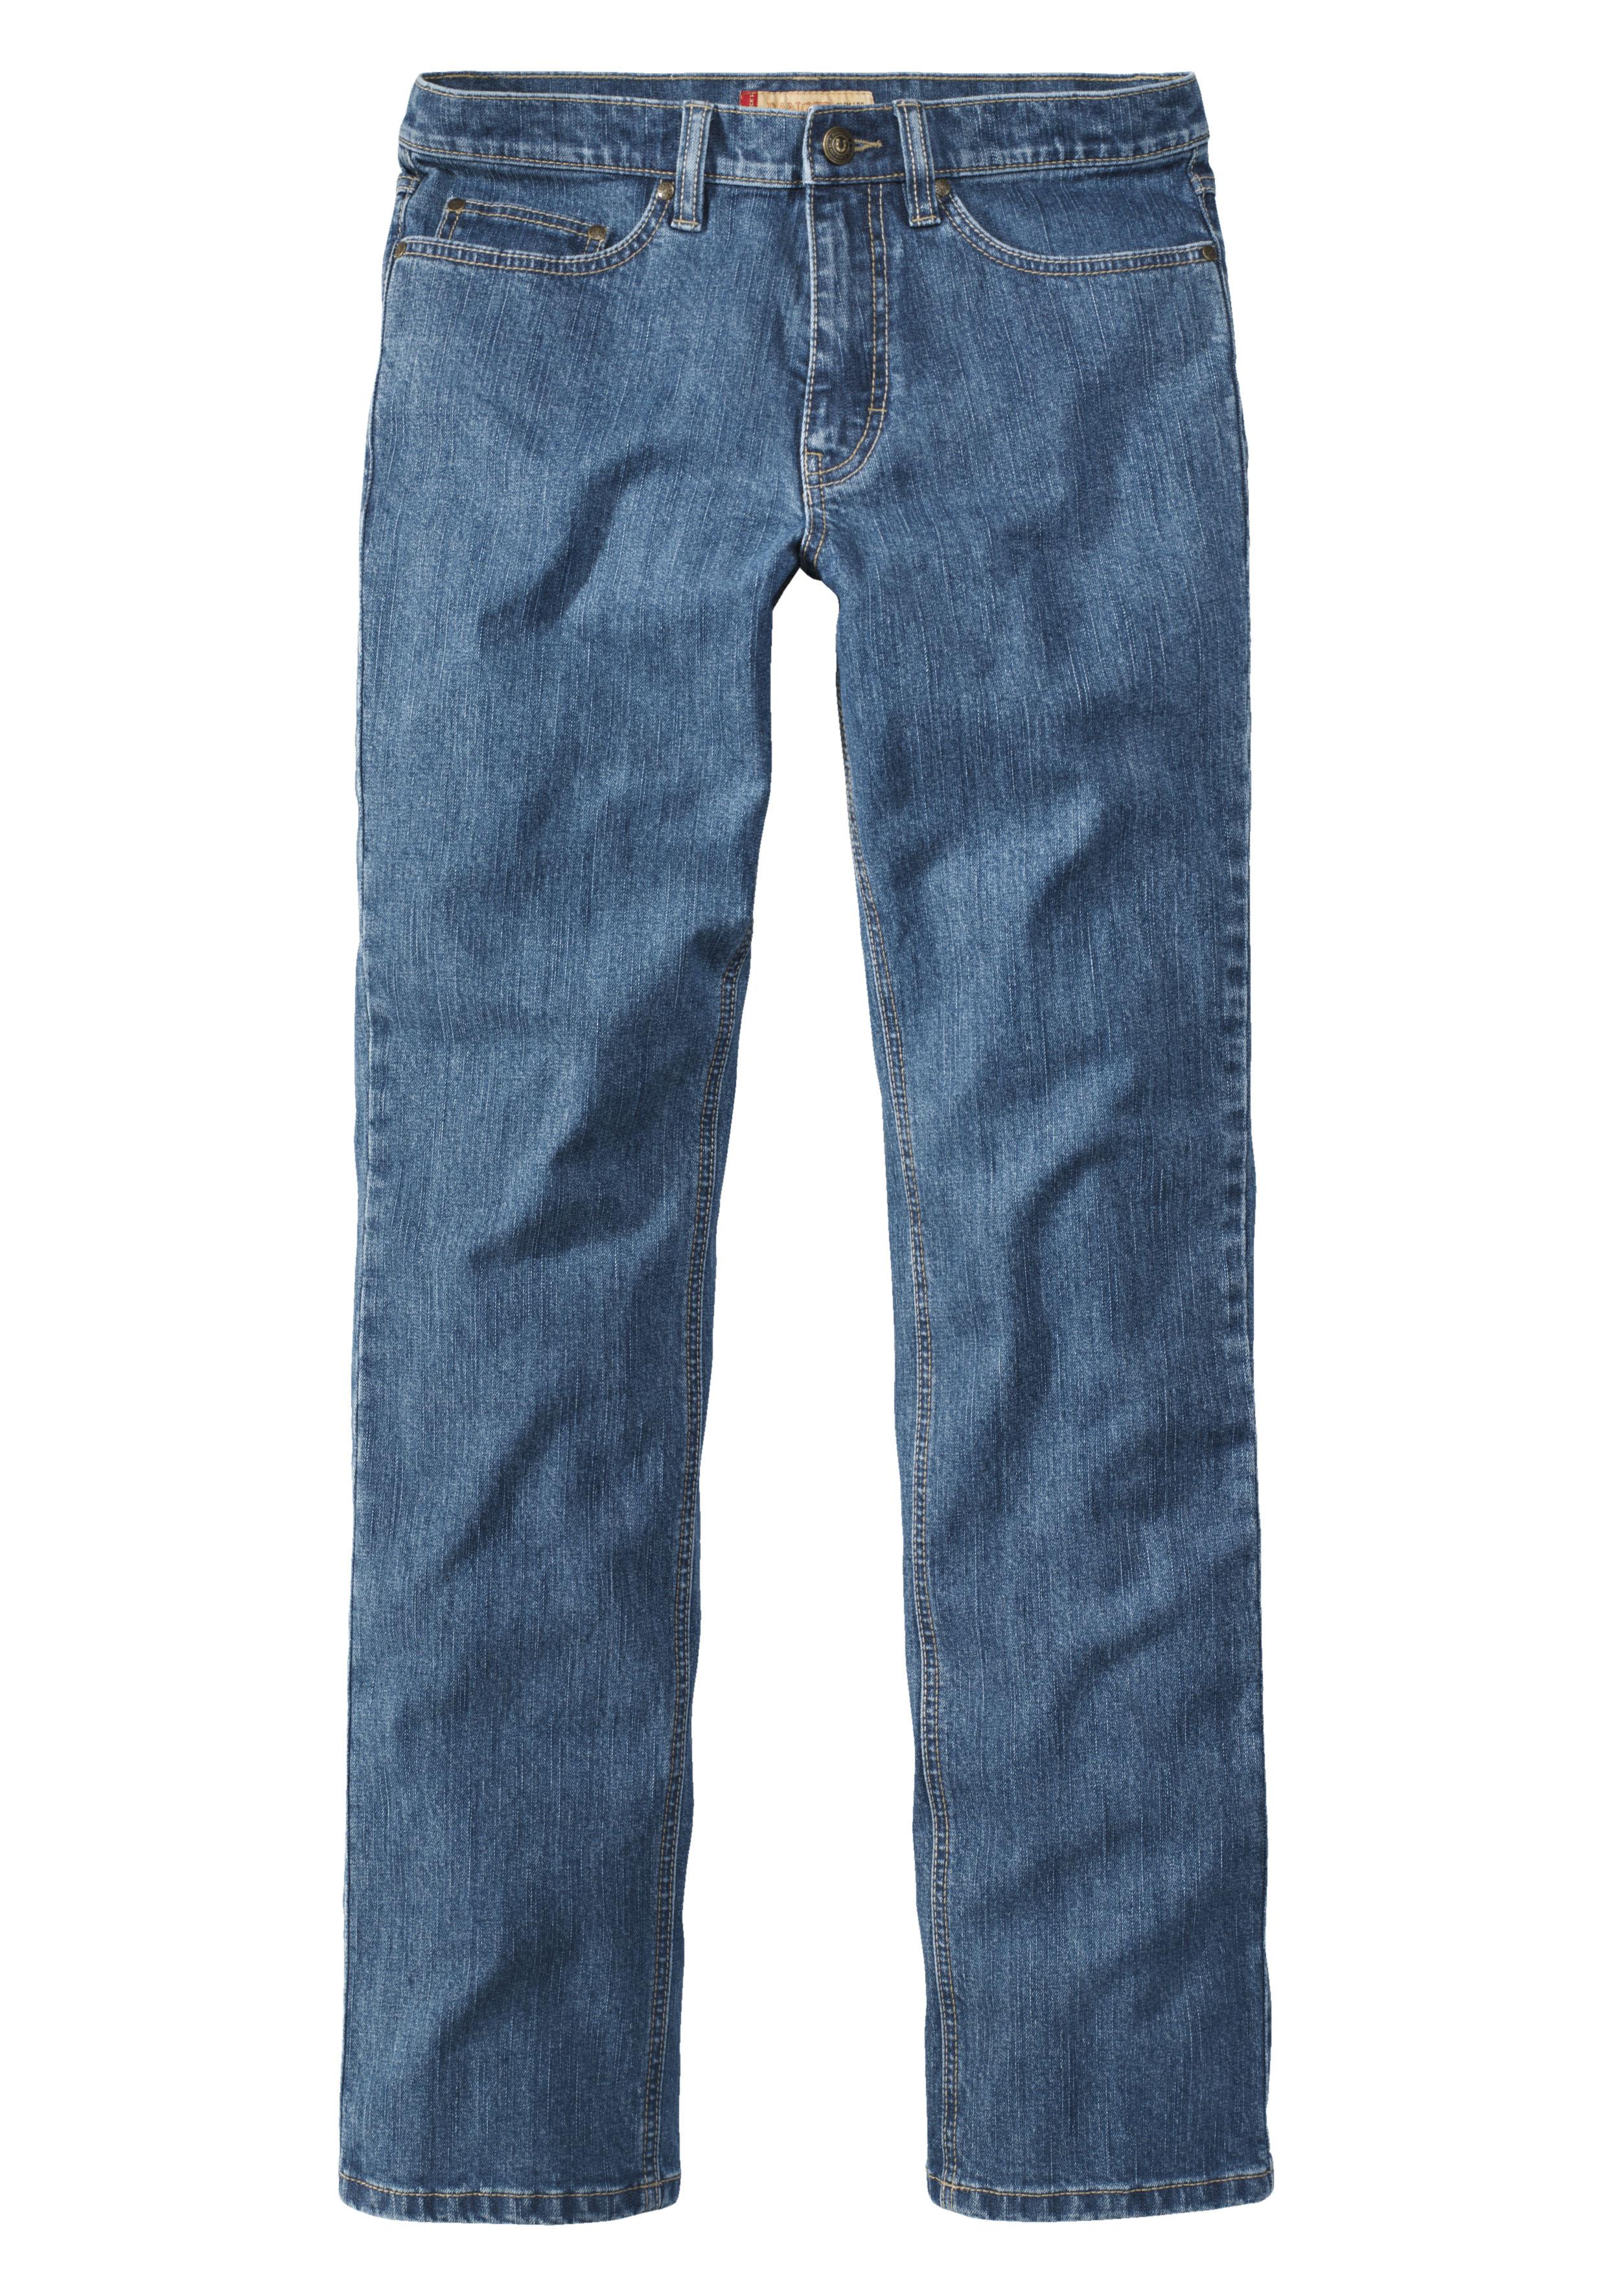 Paddocks Jeans, Ranger, steen blauw